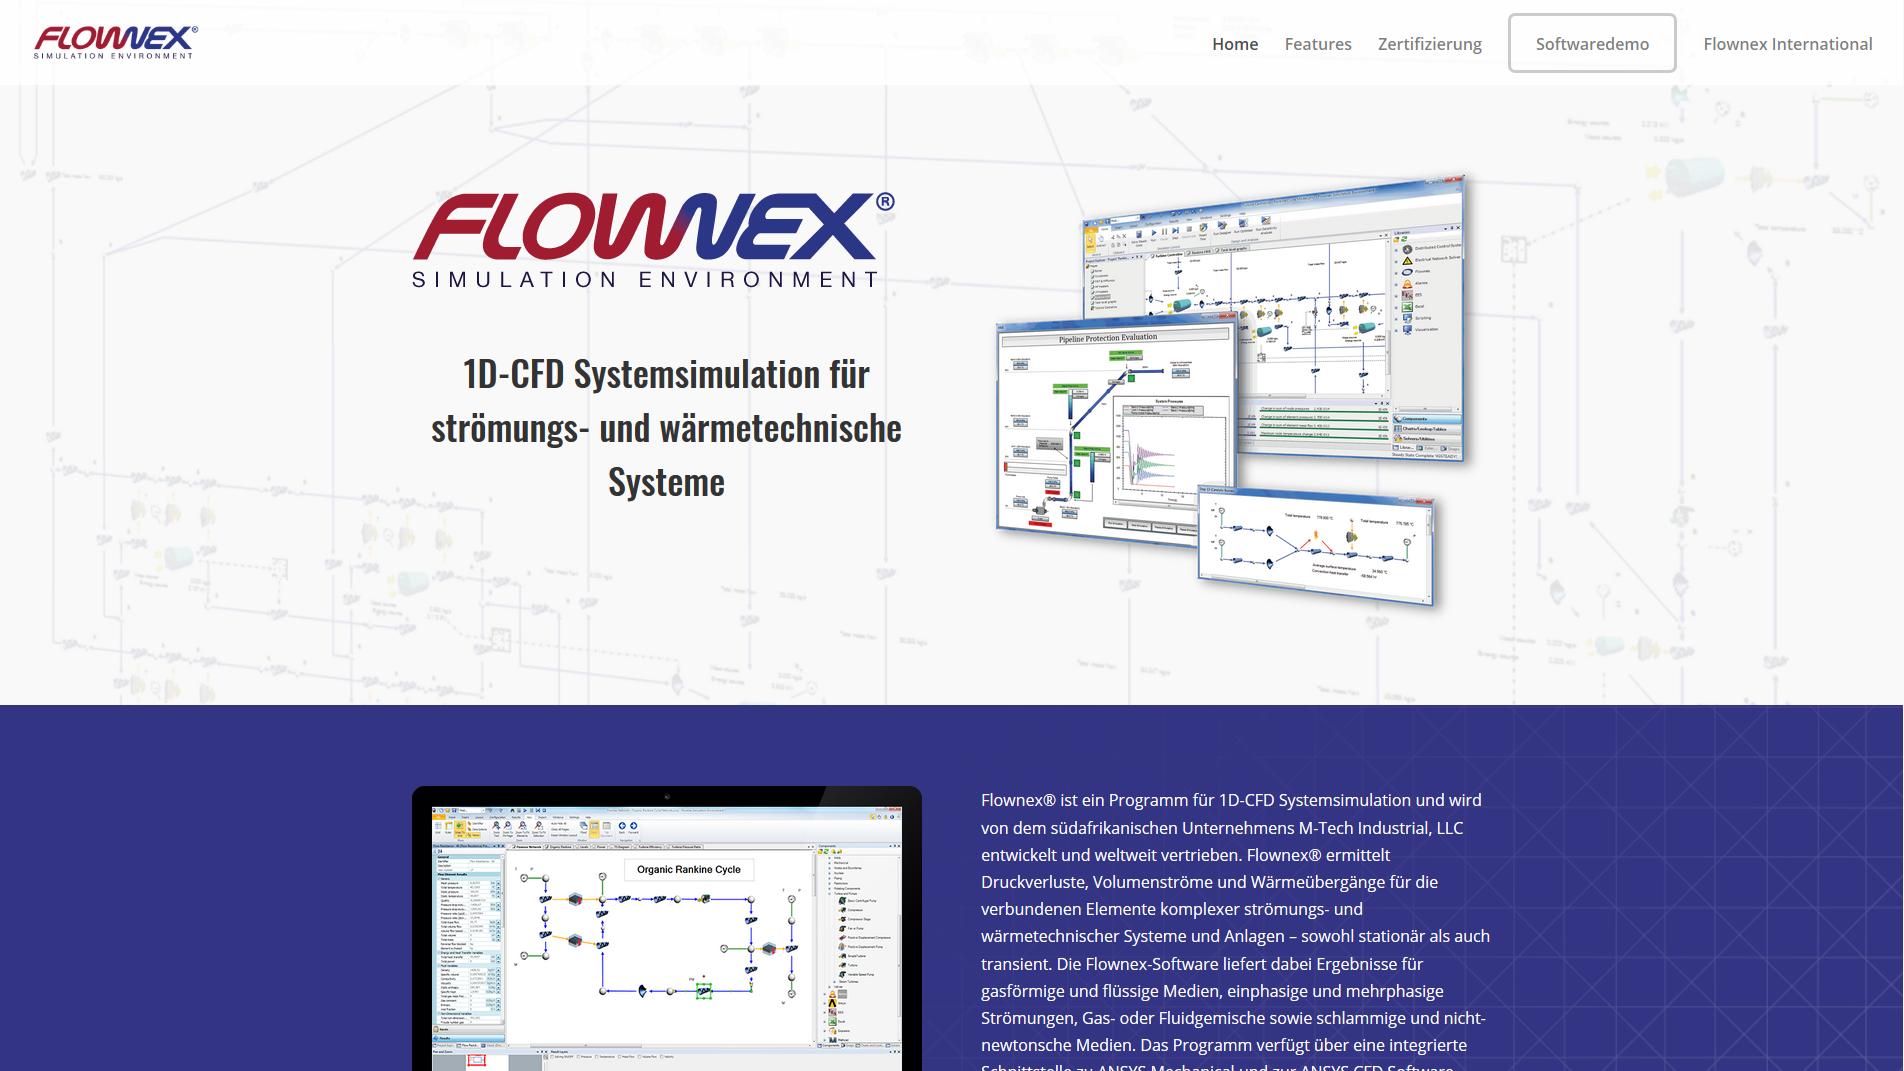 Bild neue webseite flownex.de